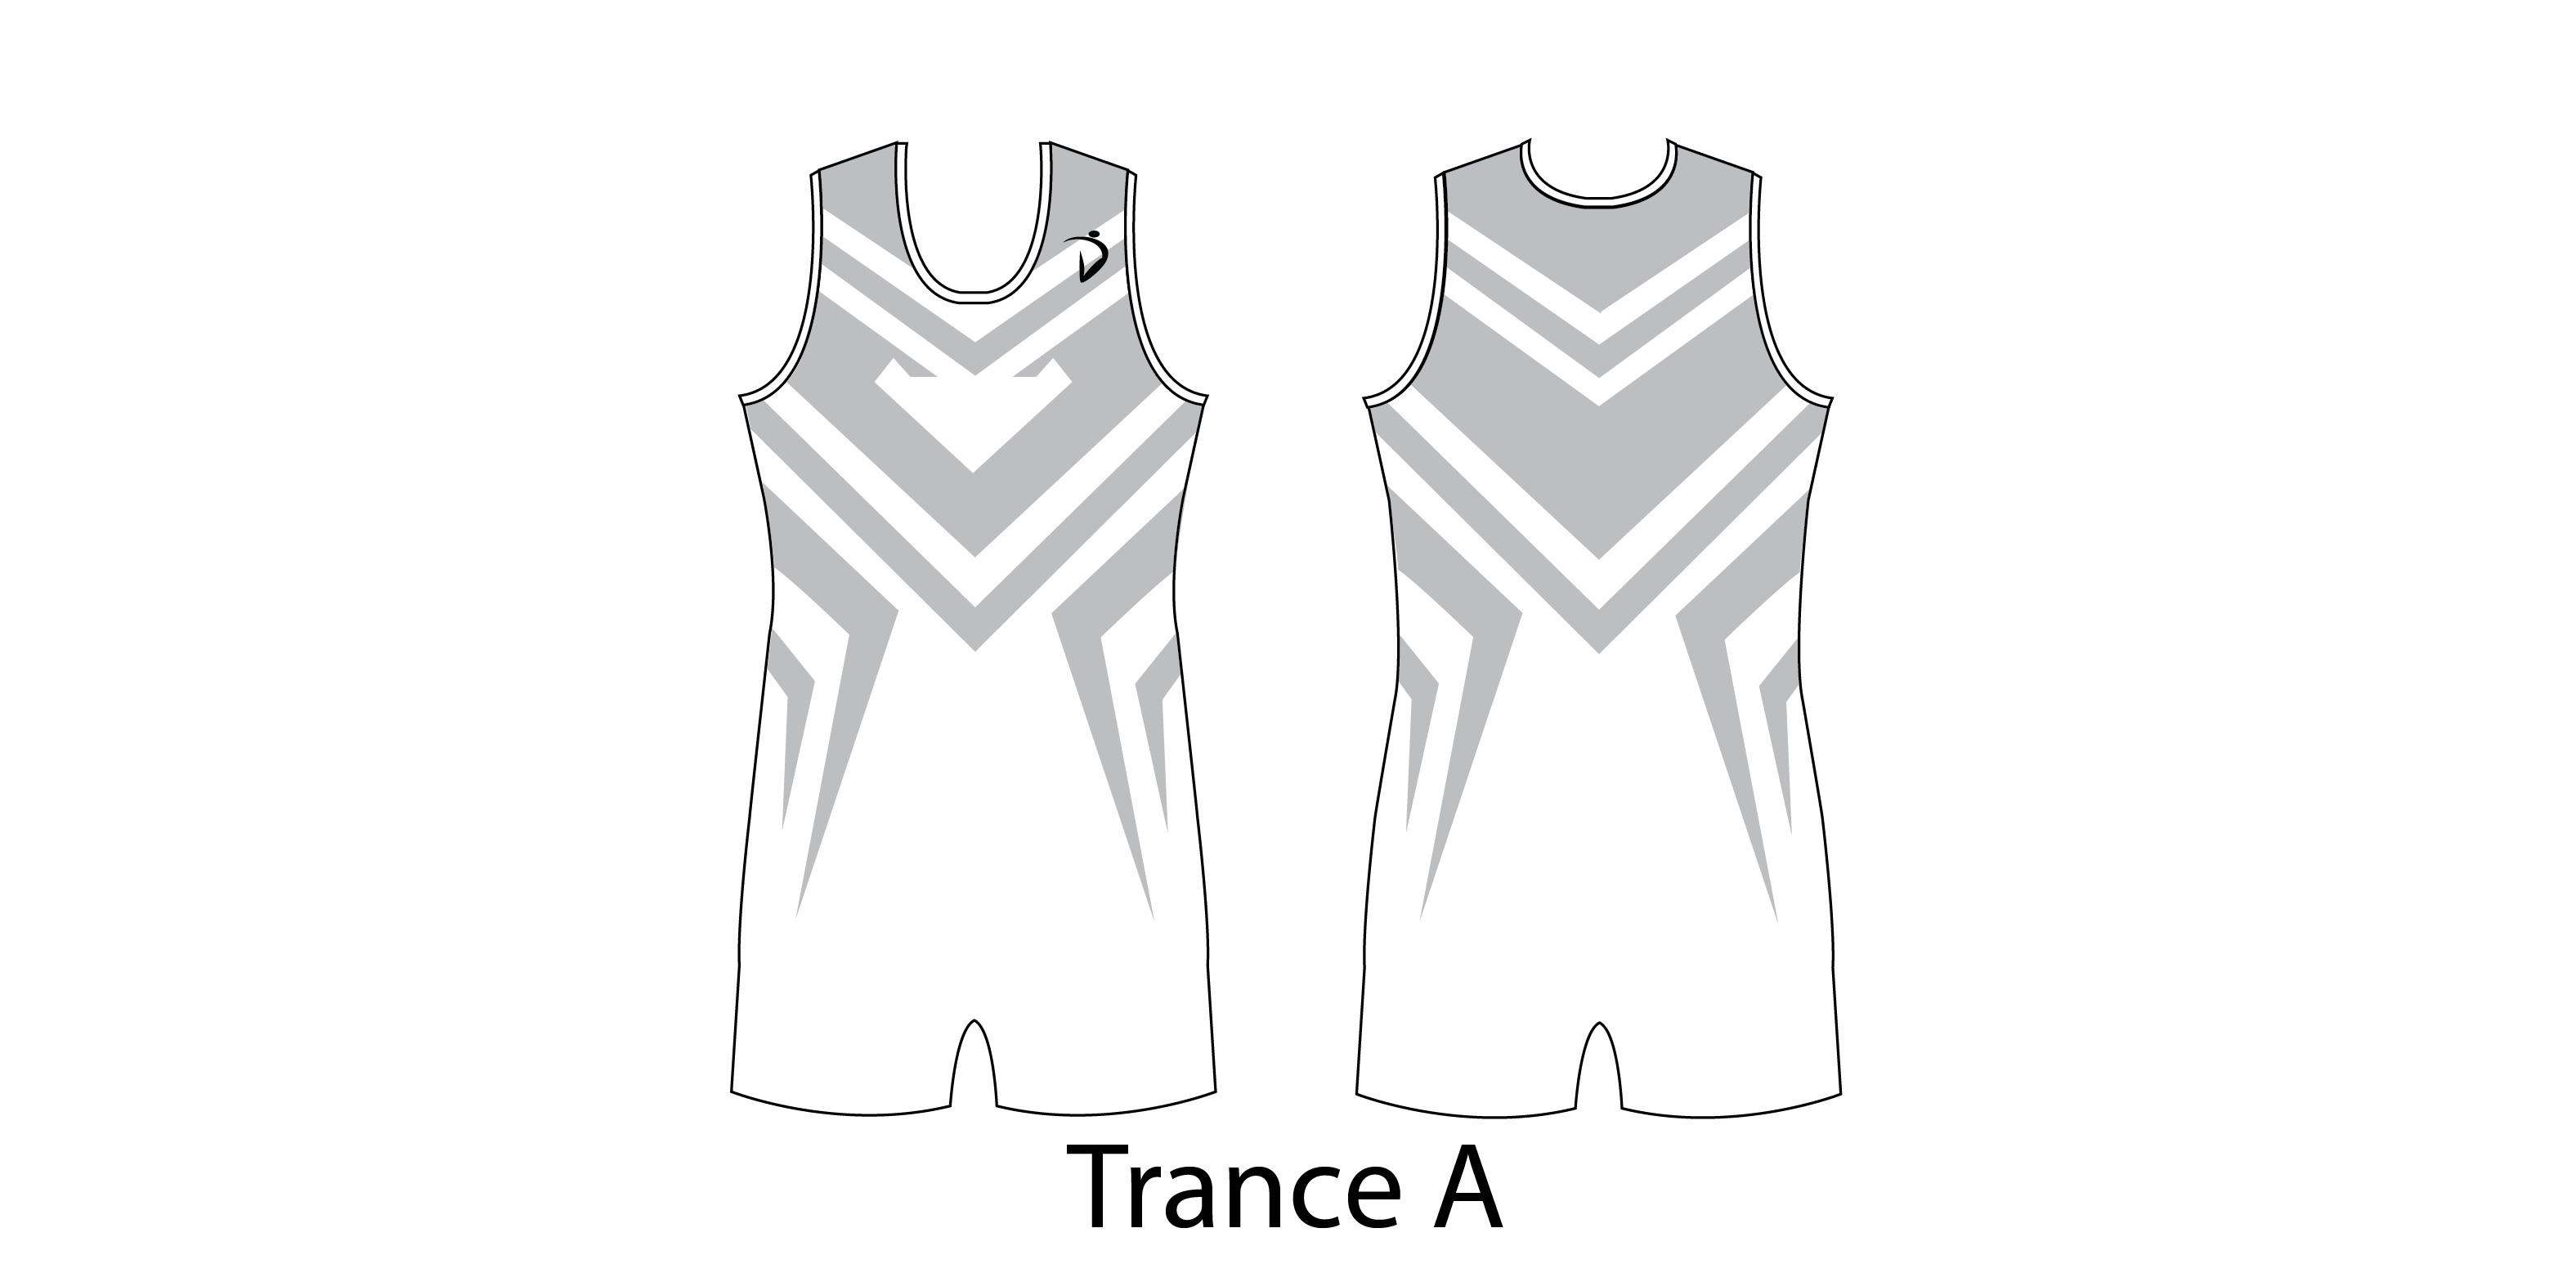 Trance A